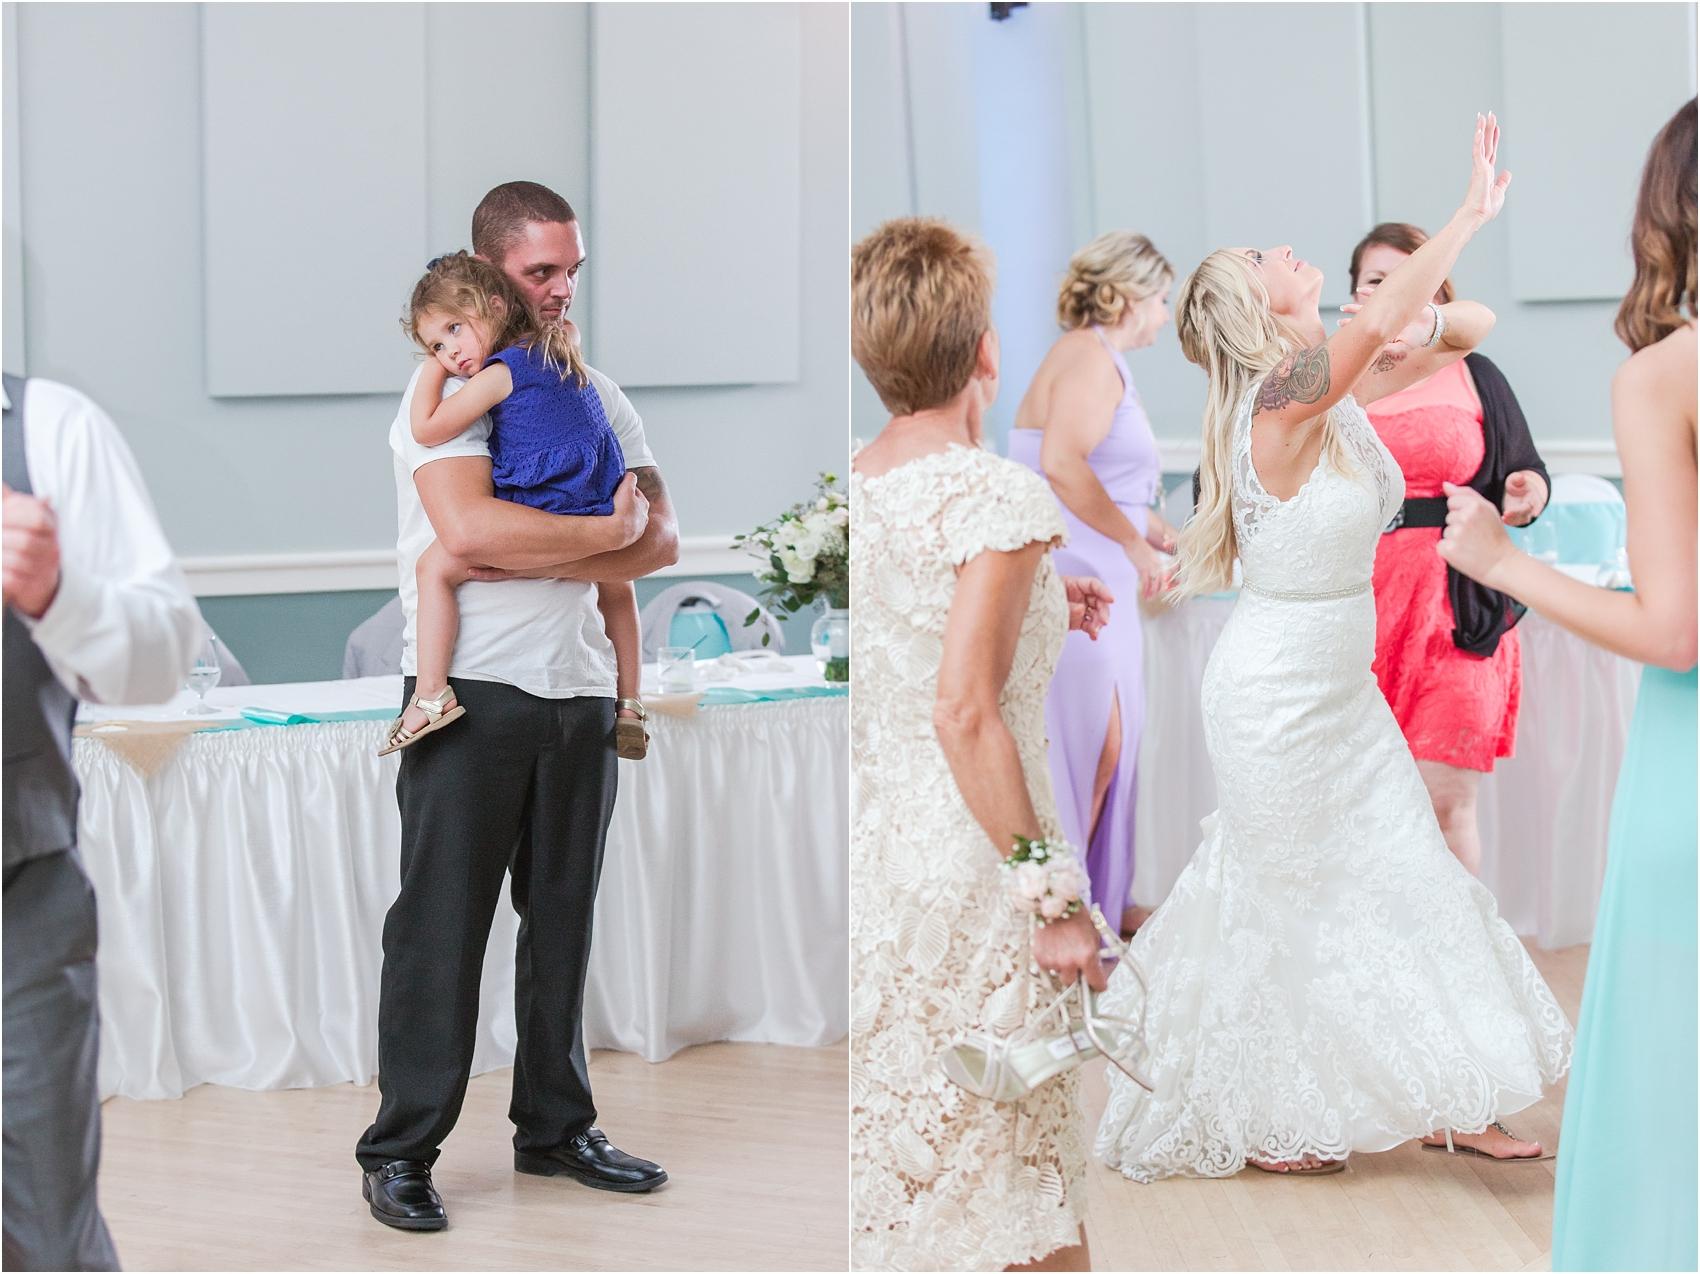 fun-whimsical-beach-wedding-photos-in-st-joseph-michigan-by-courtney-carolyn-photography_0094.jpg